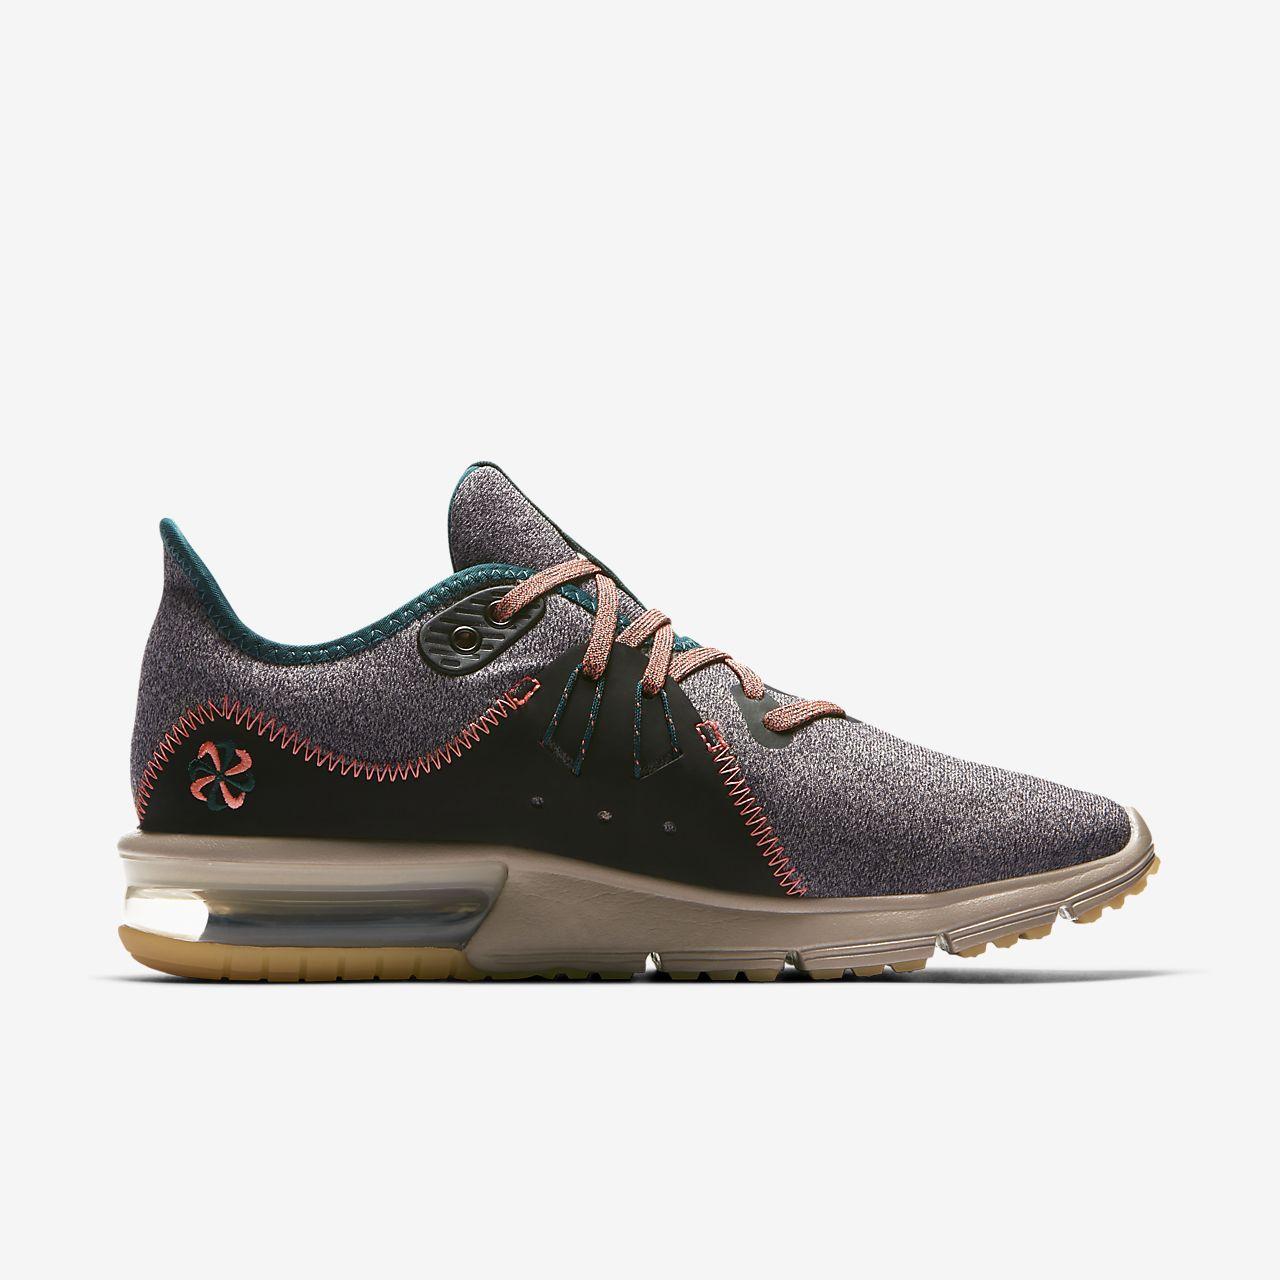 766eb1ed7cf4 Nike Air Max Sequent 3 Premium V Women s Running Shoe. Nike.com SA